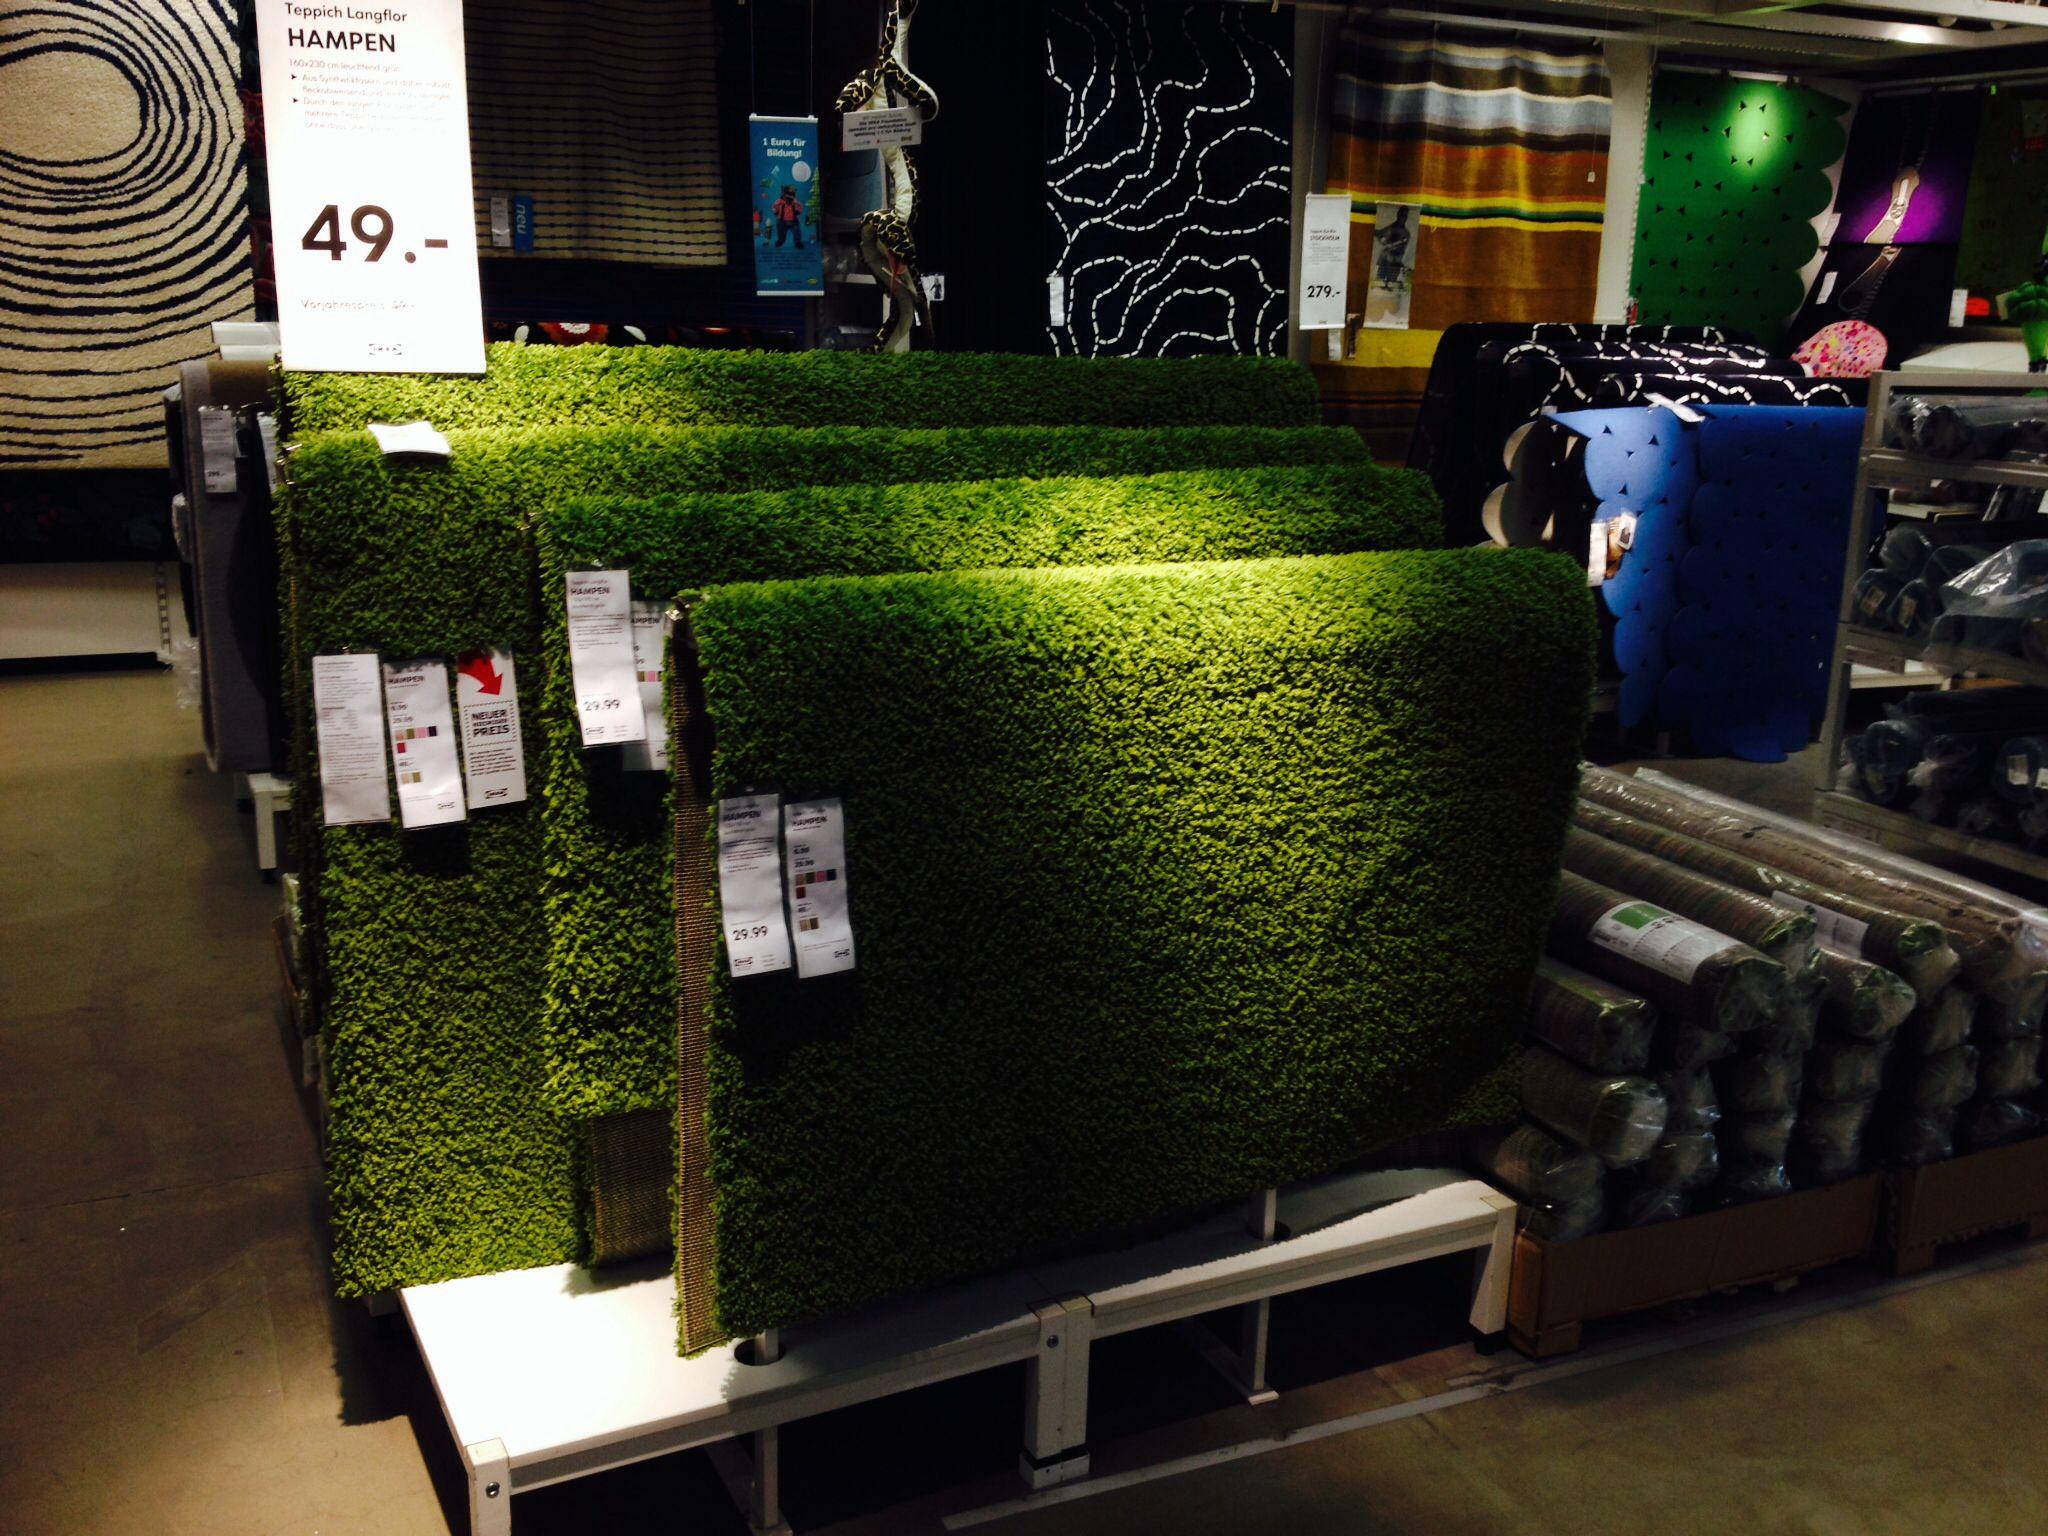 Grass Carpet Ikea Buying Carpet Grass Carpet Hallway Carpet